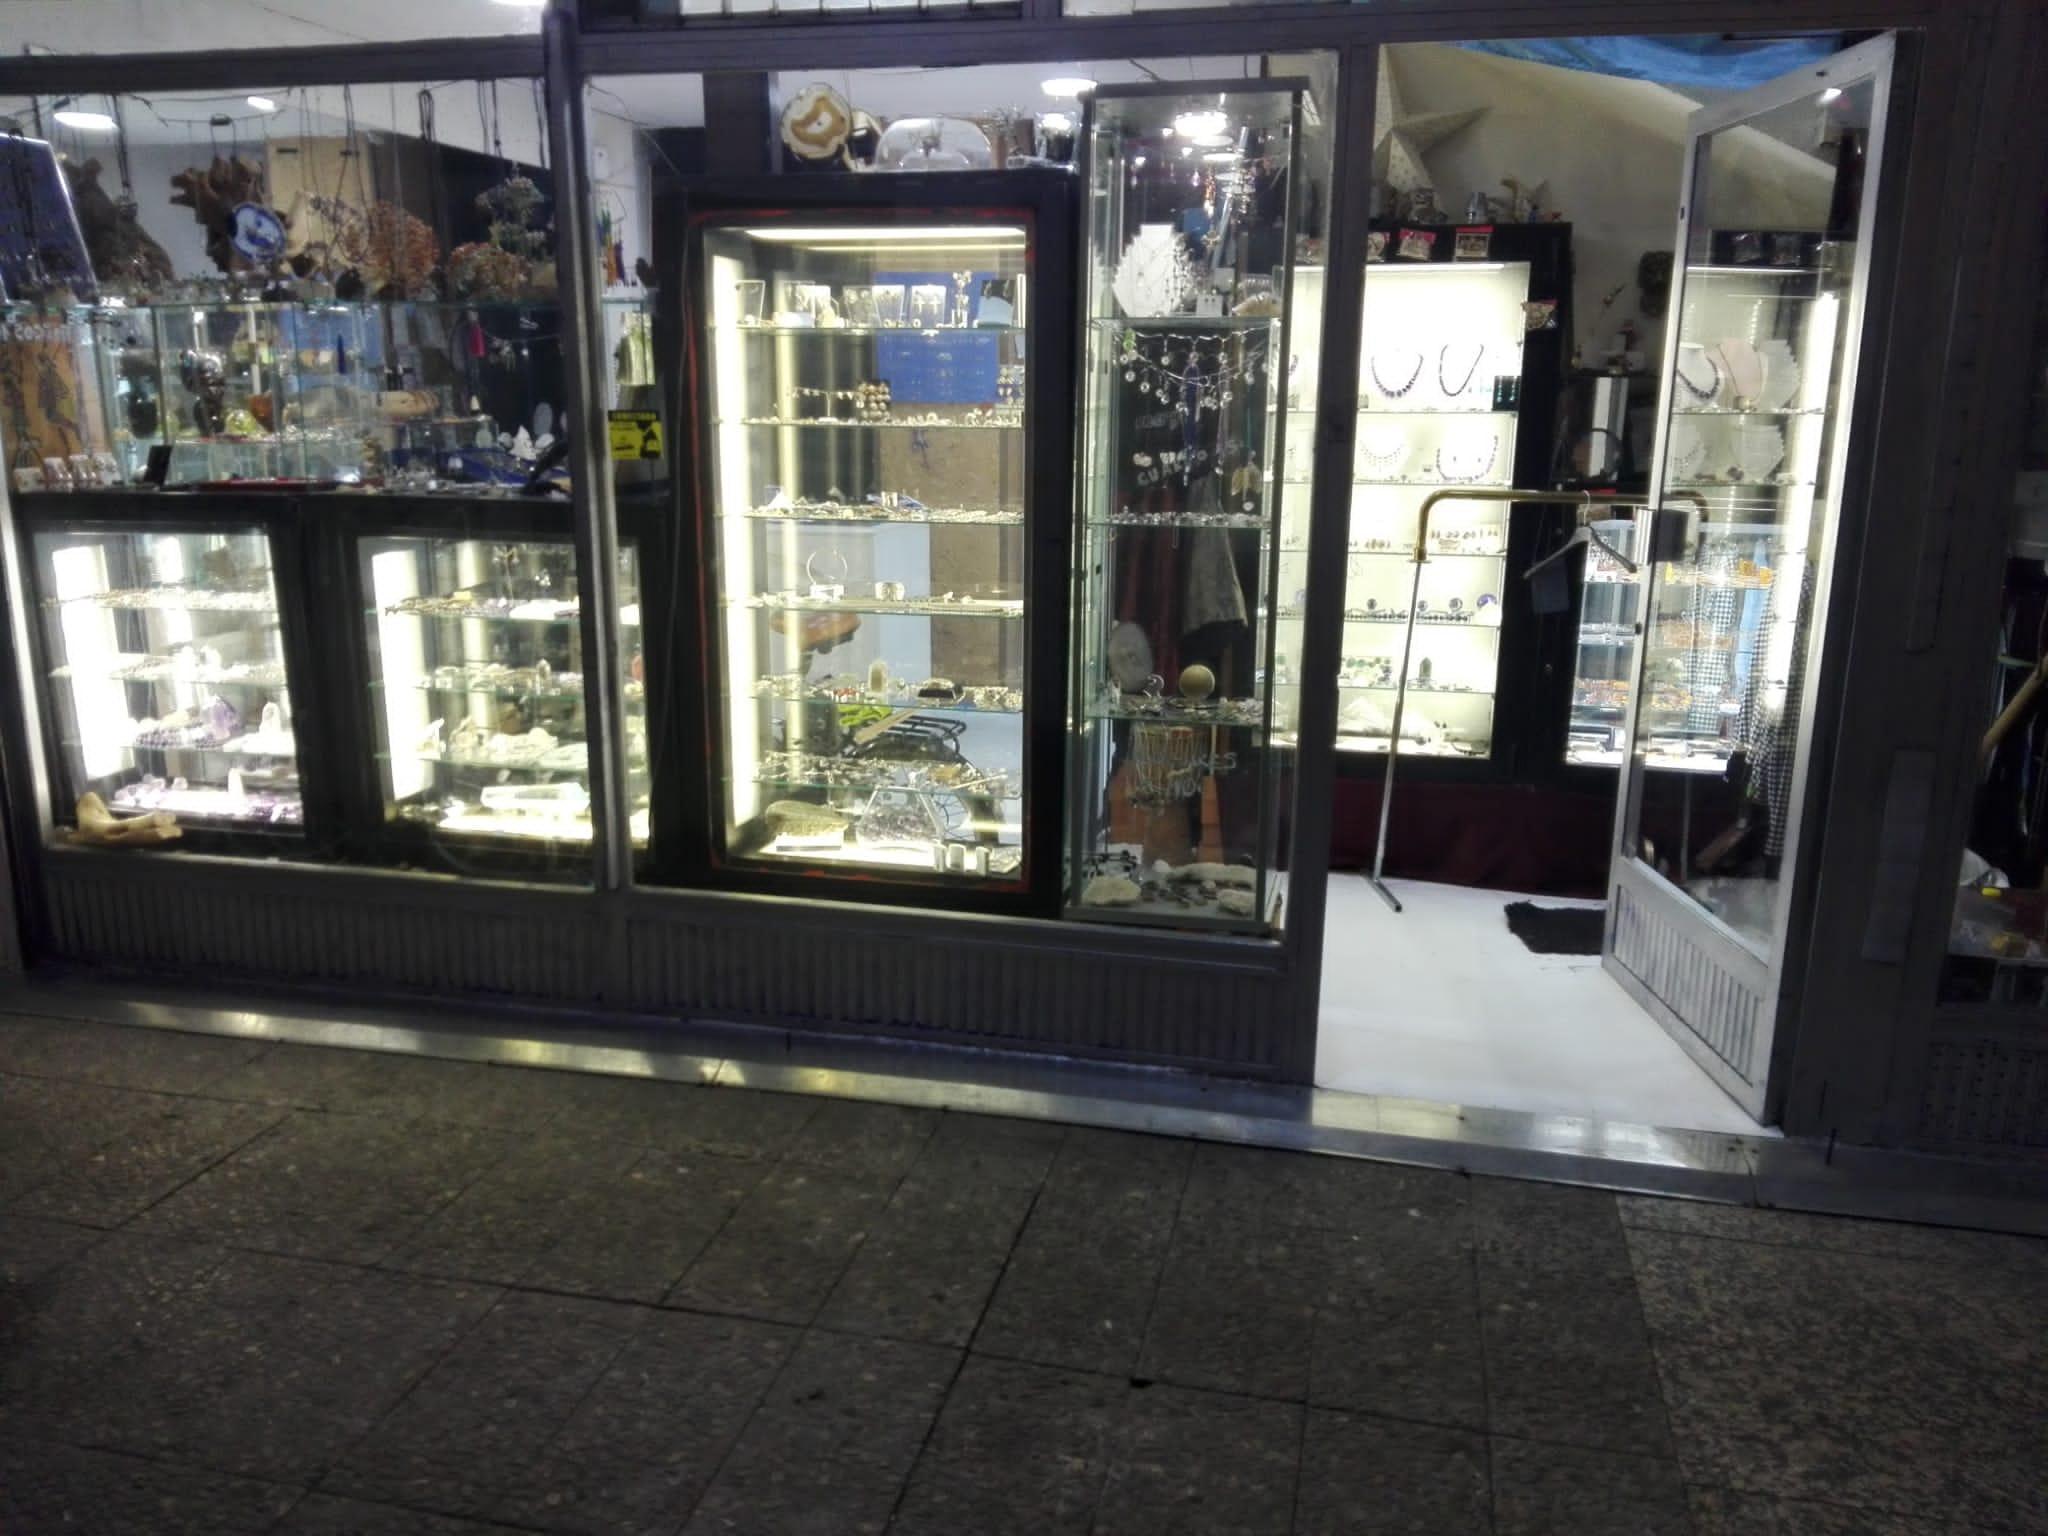 (Español) Orense – Se traspasa local comercial de 50 m2